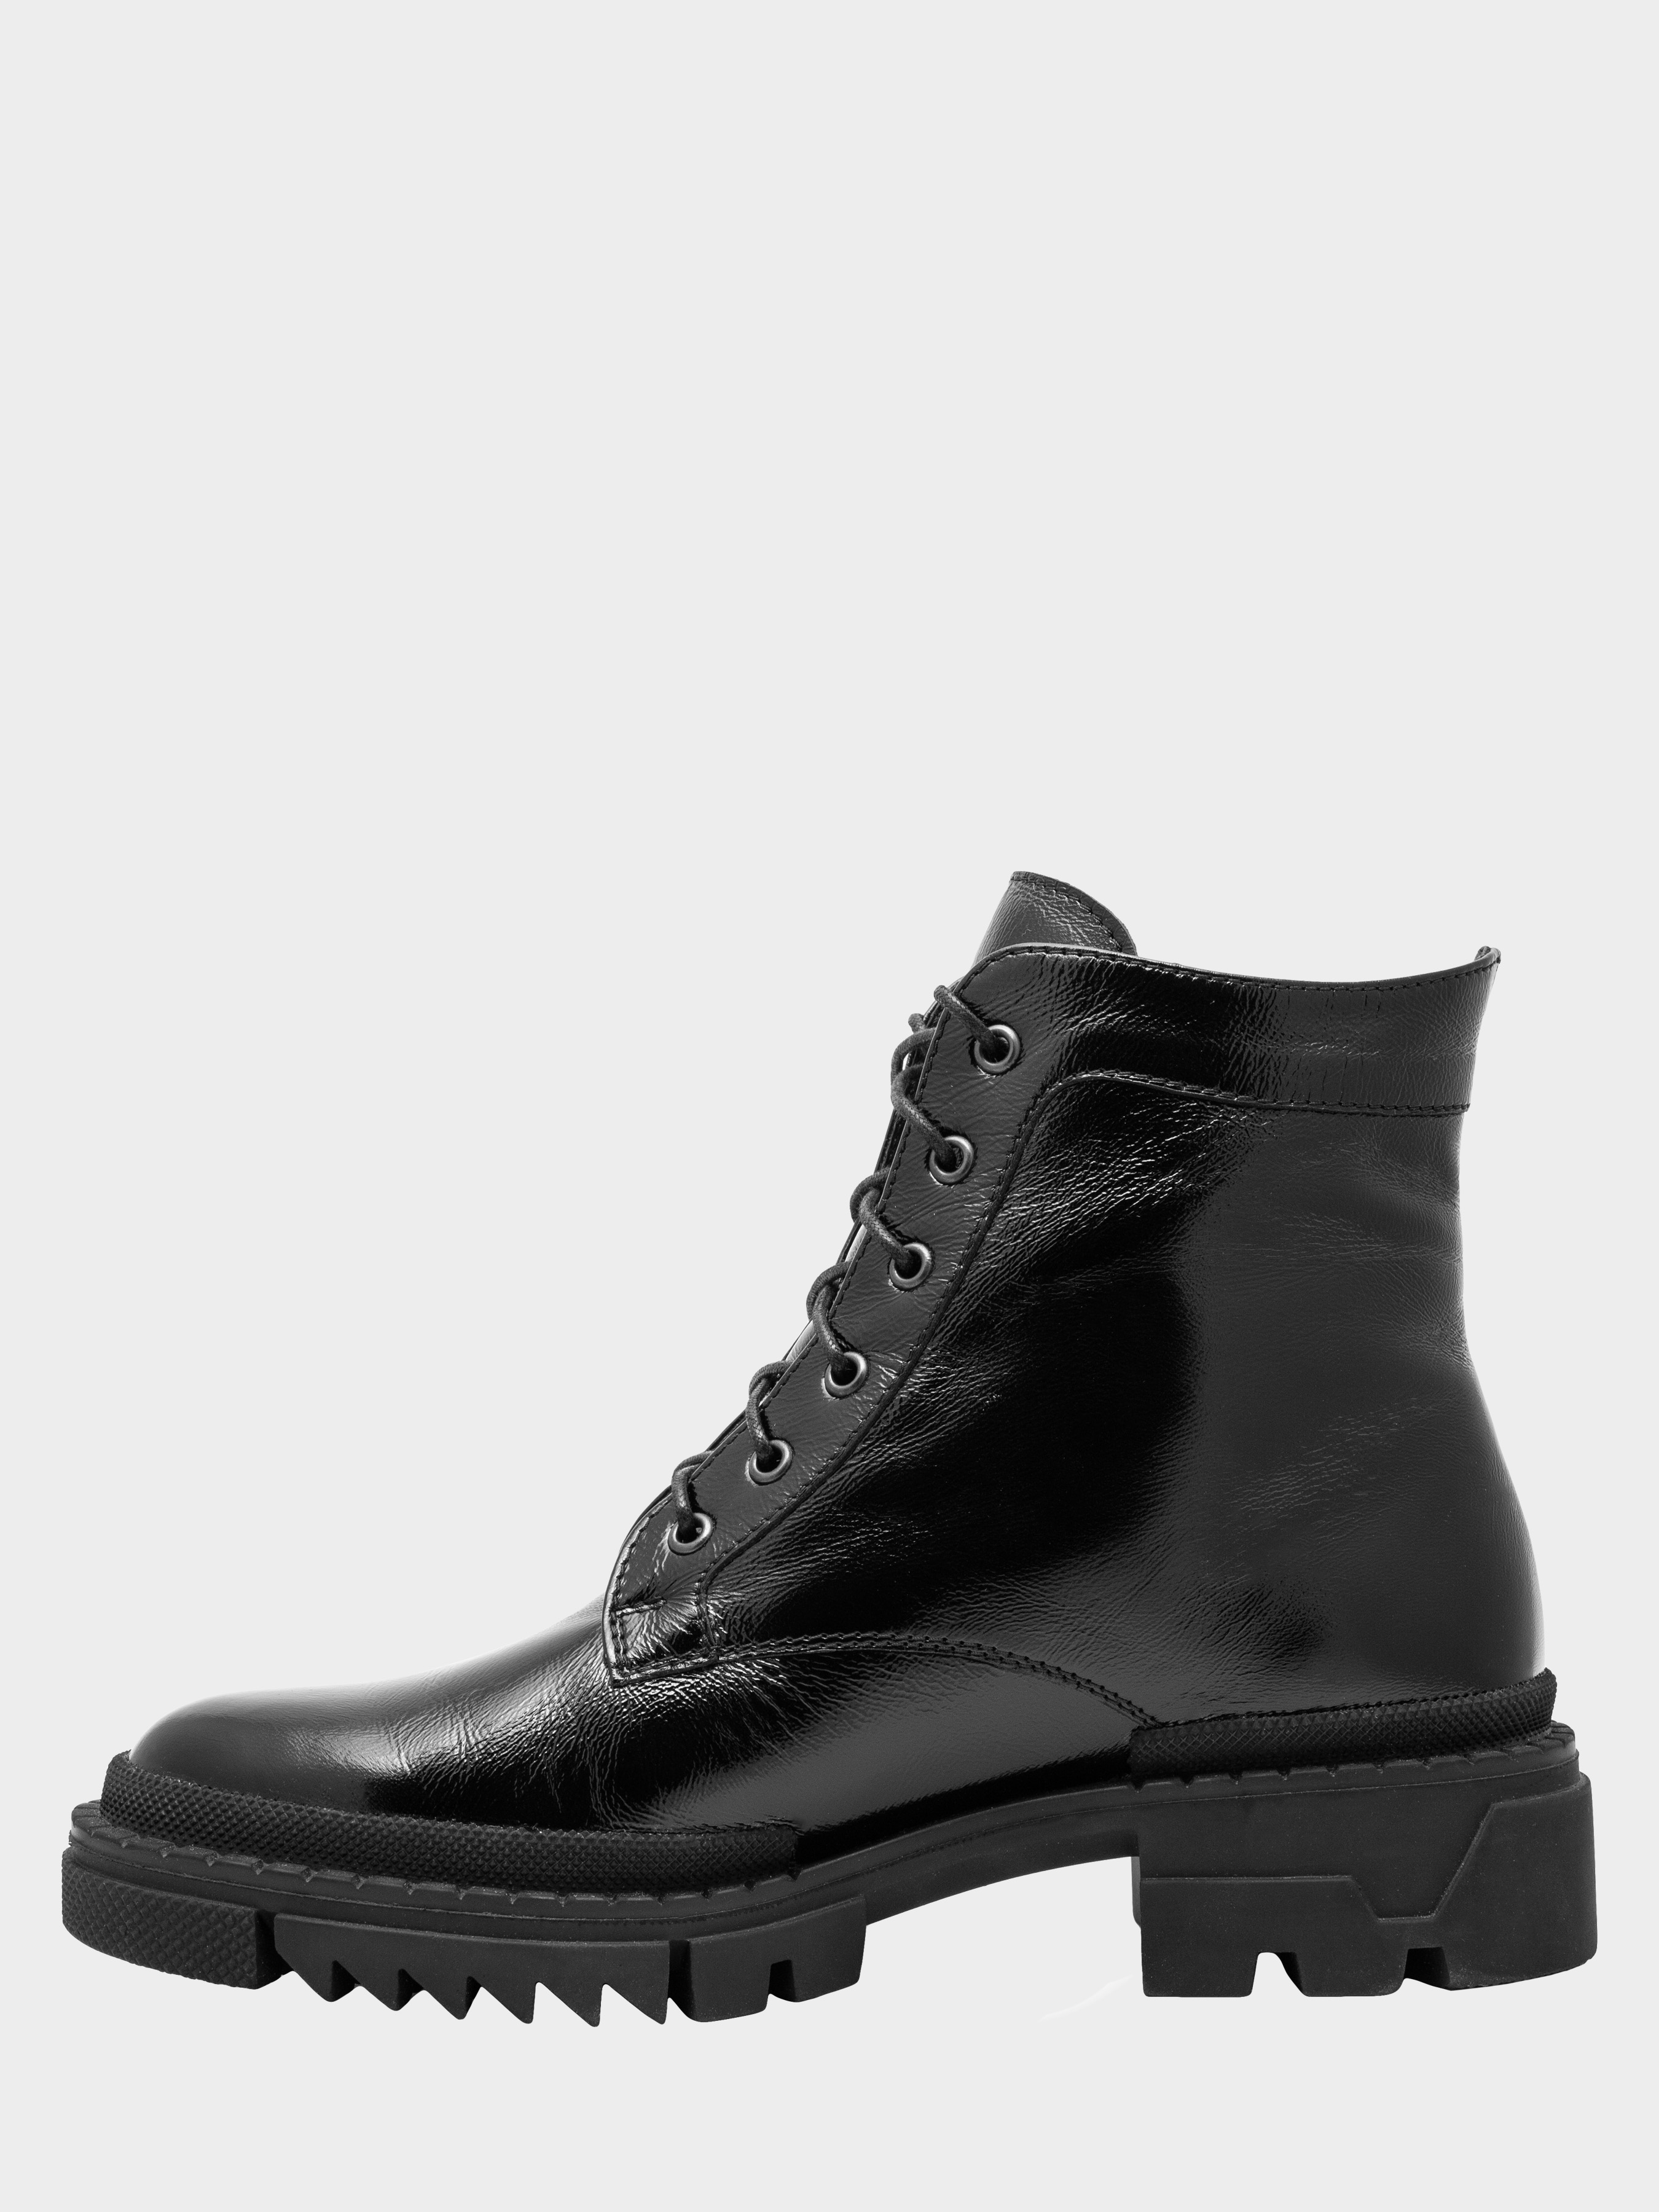 Ботинки для женщин Ботинки женские ENZO VERRATTI 18-7449-3napblack обувь бренда, 2017